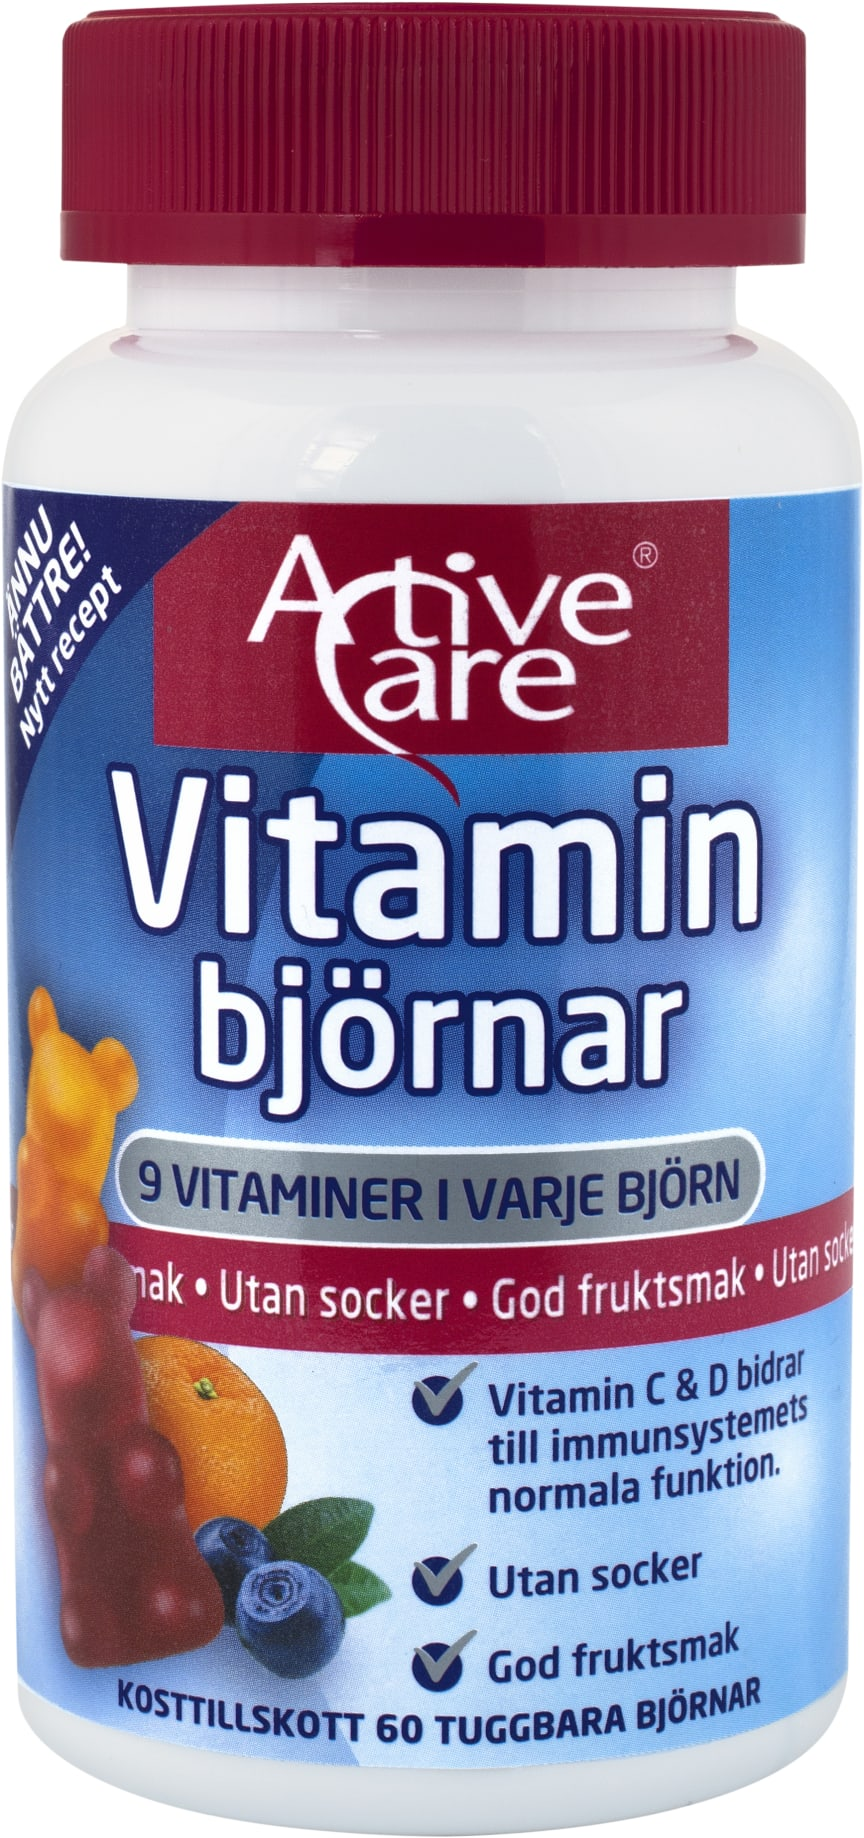 vitaminbjörnar active care